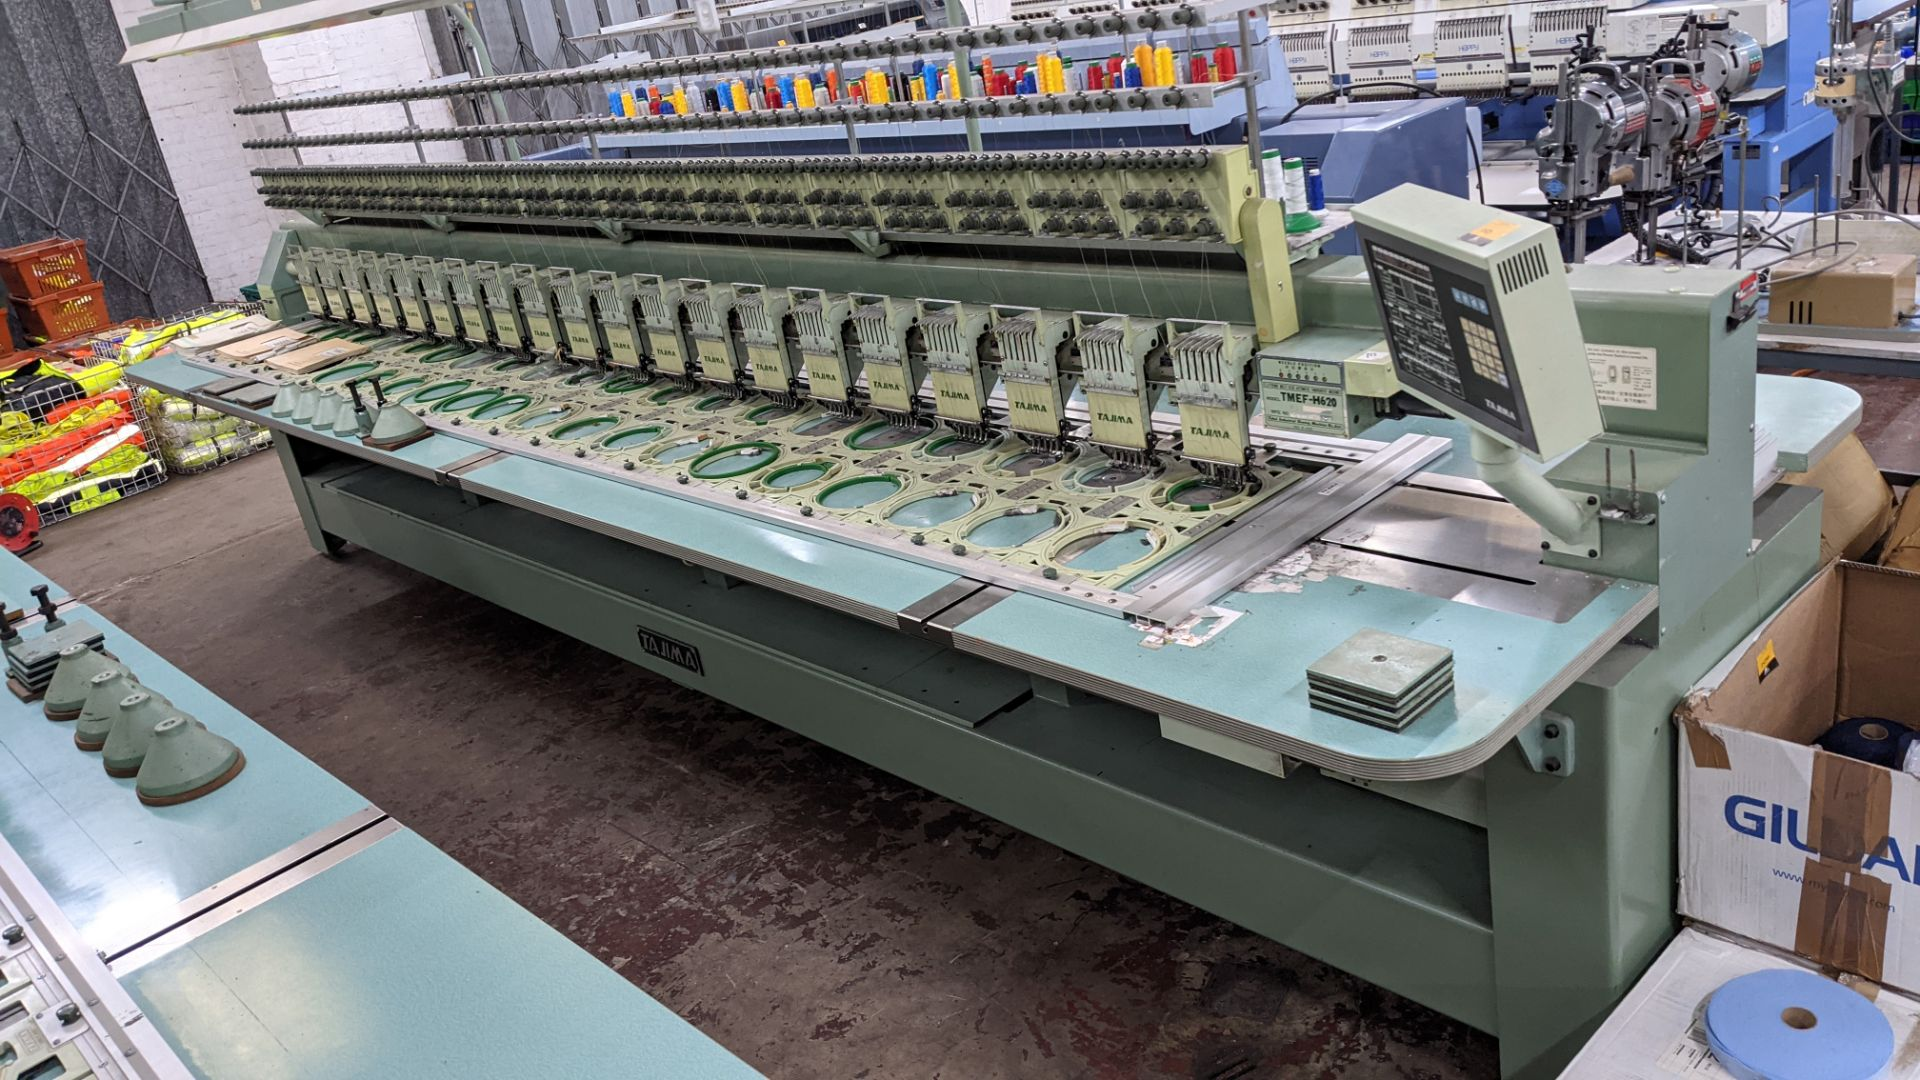 Tokai Tajima electronic 20 head automatic embroidery machine model TMEF-H620 - Image 2 of 25